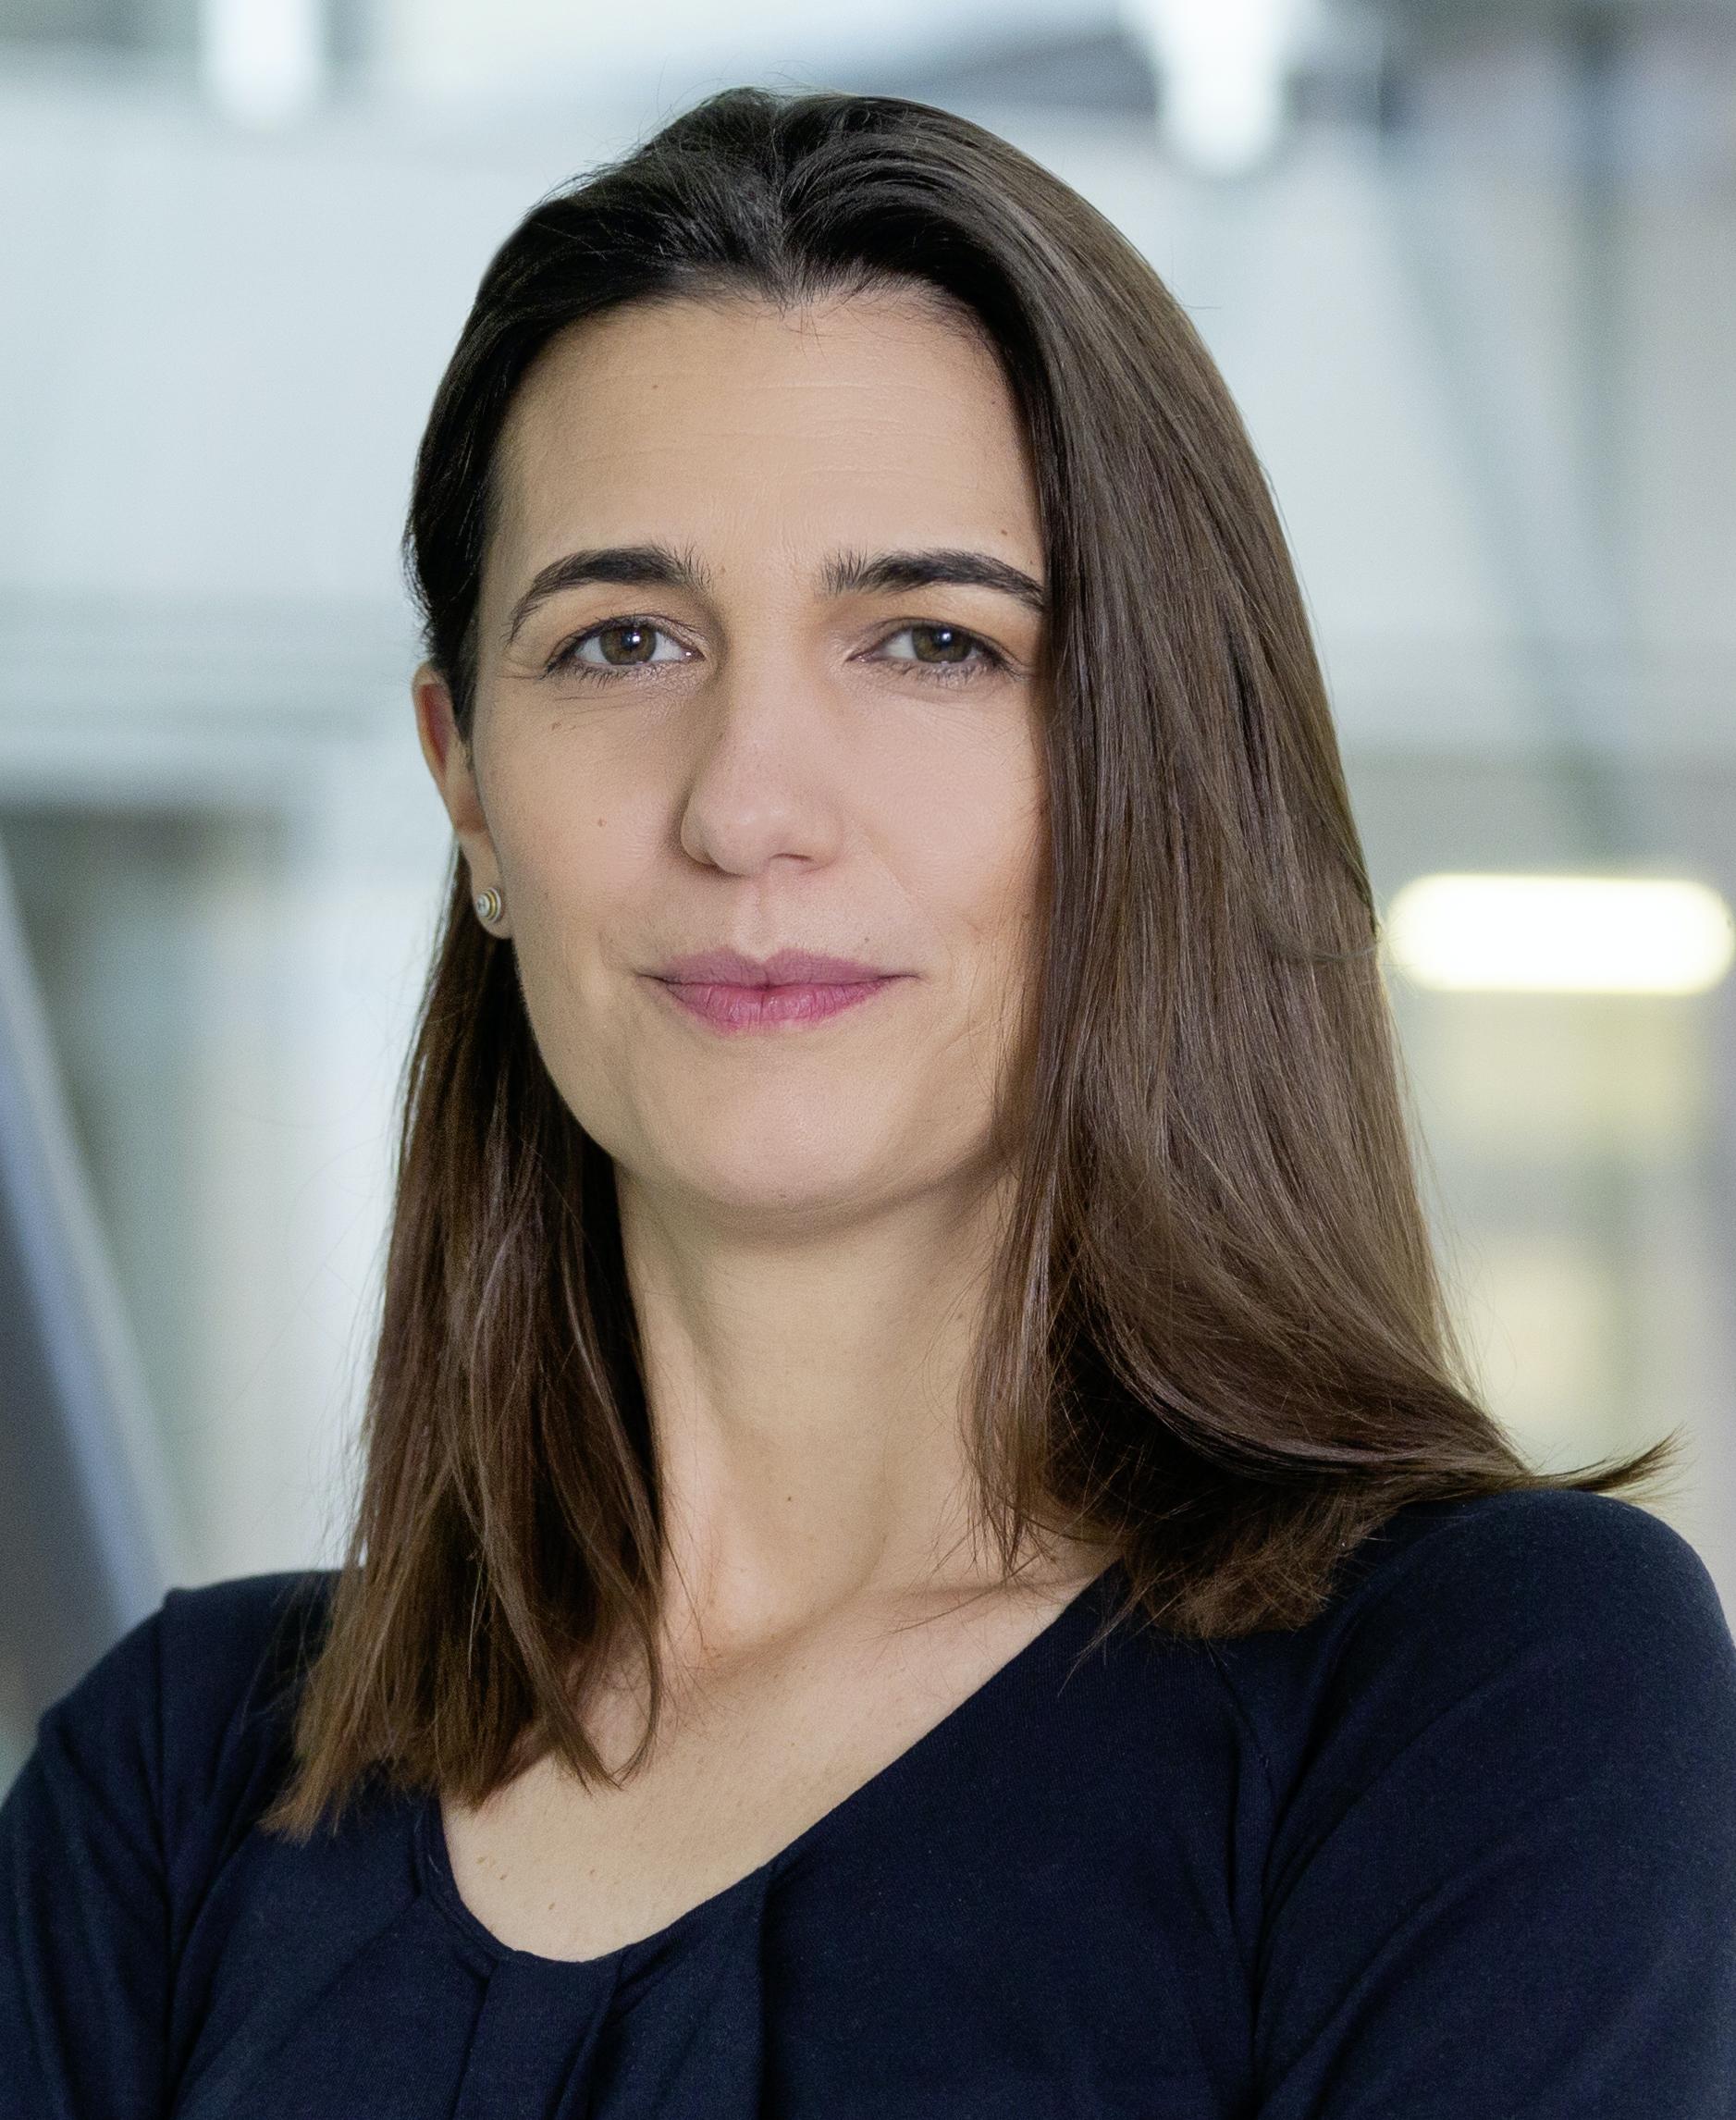 Melanie Brinkmann